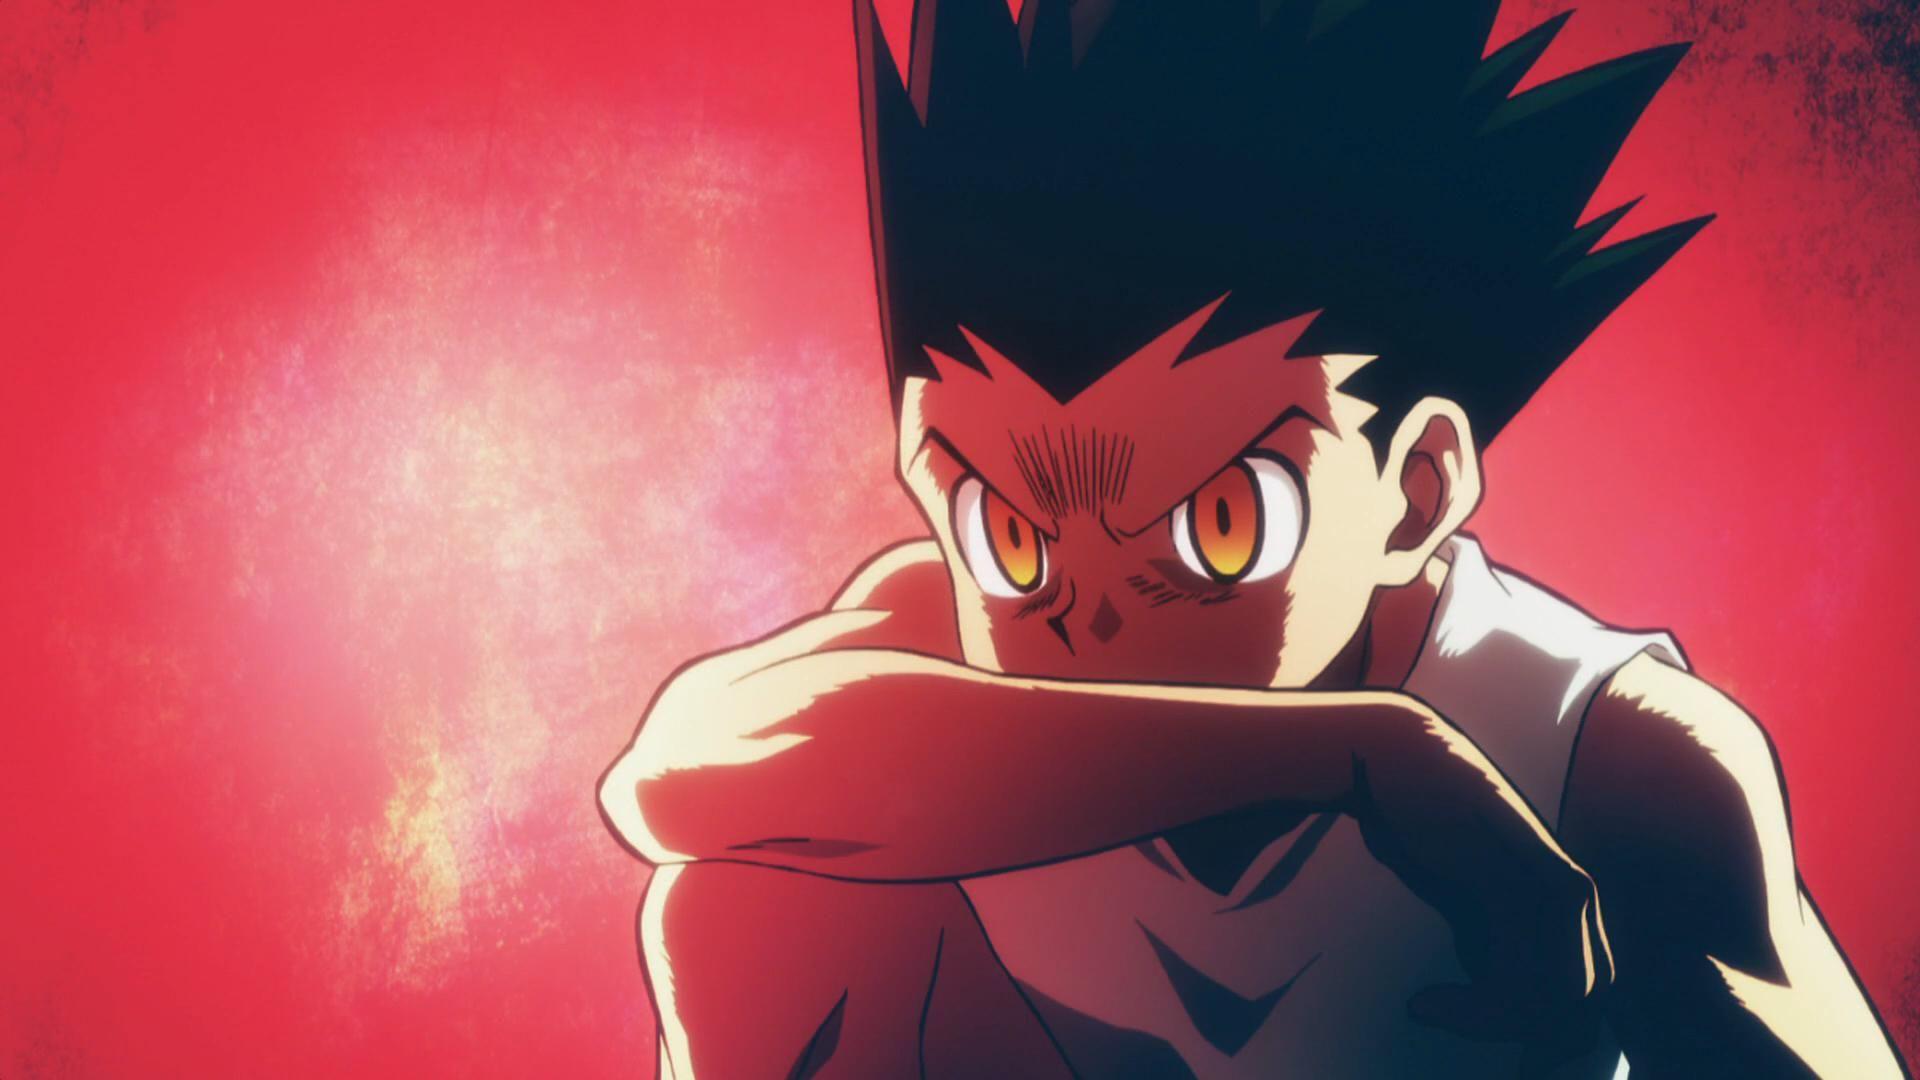 Wallpapers Hunter X Hunter Anime Wallpaper Anime